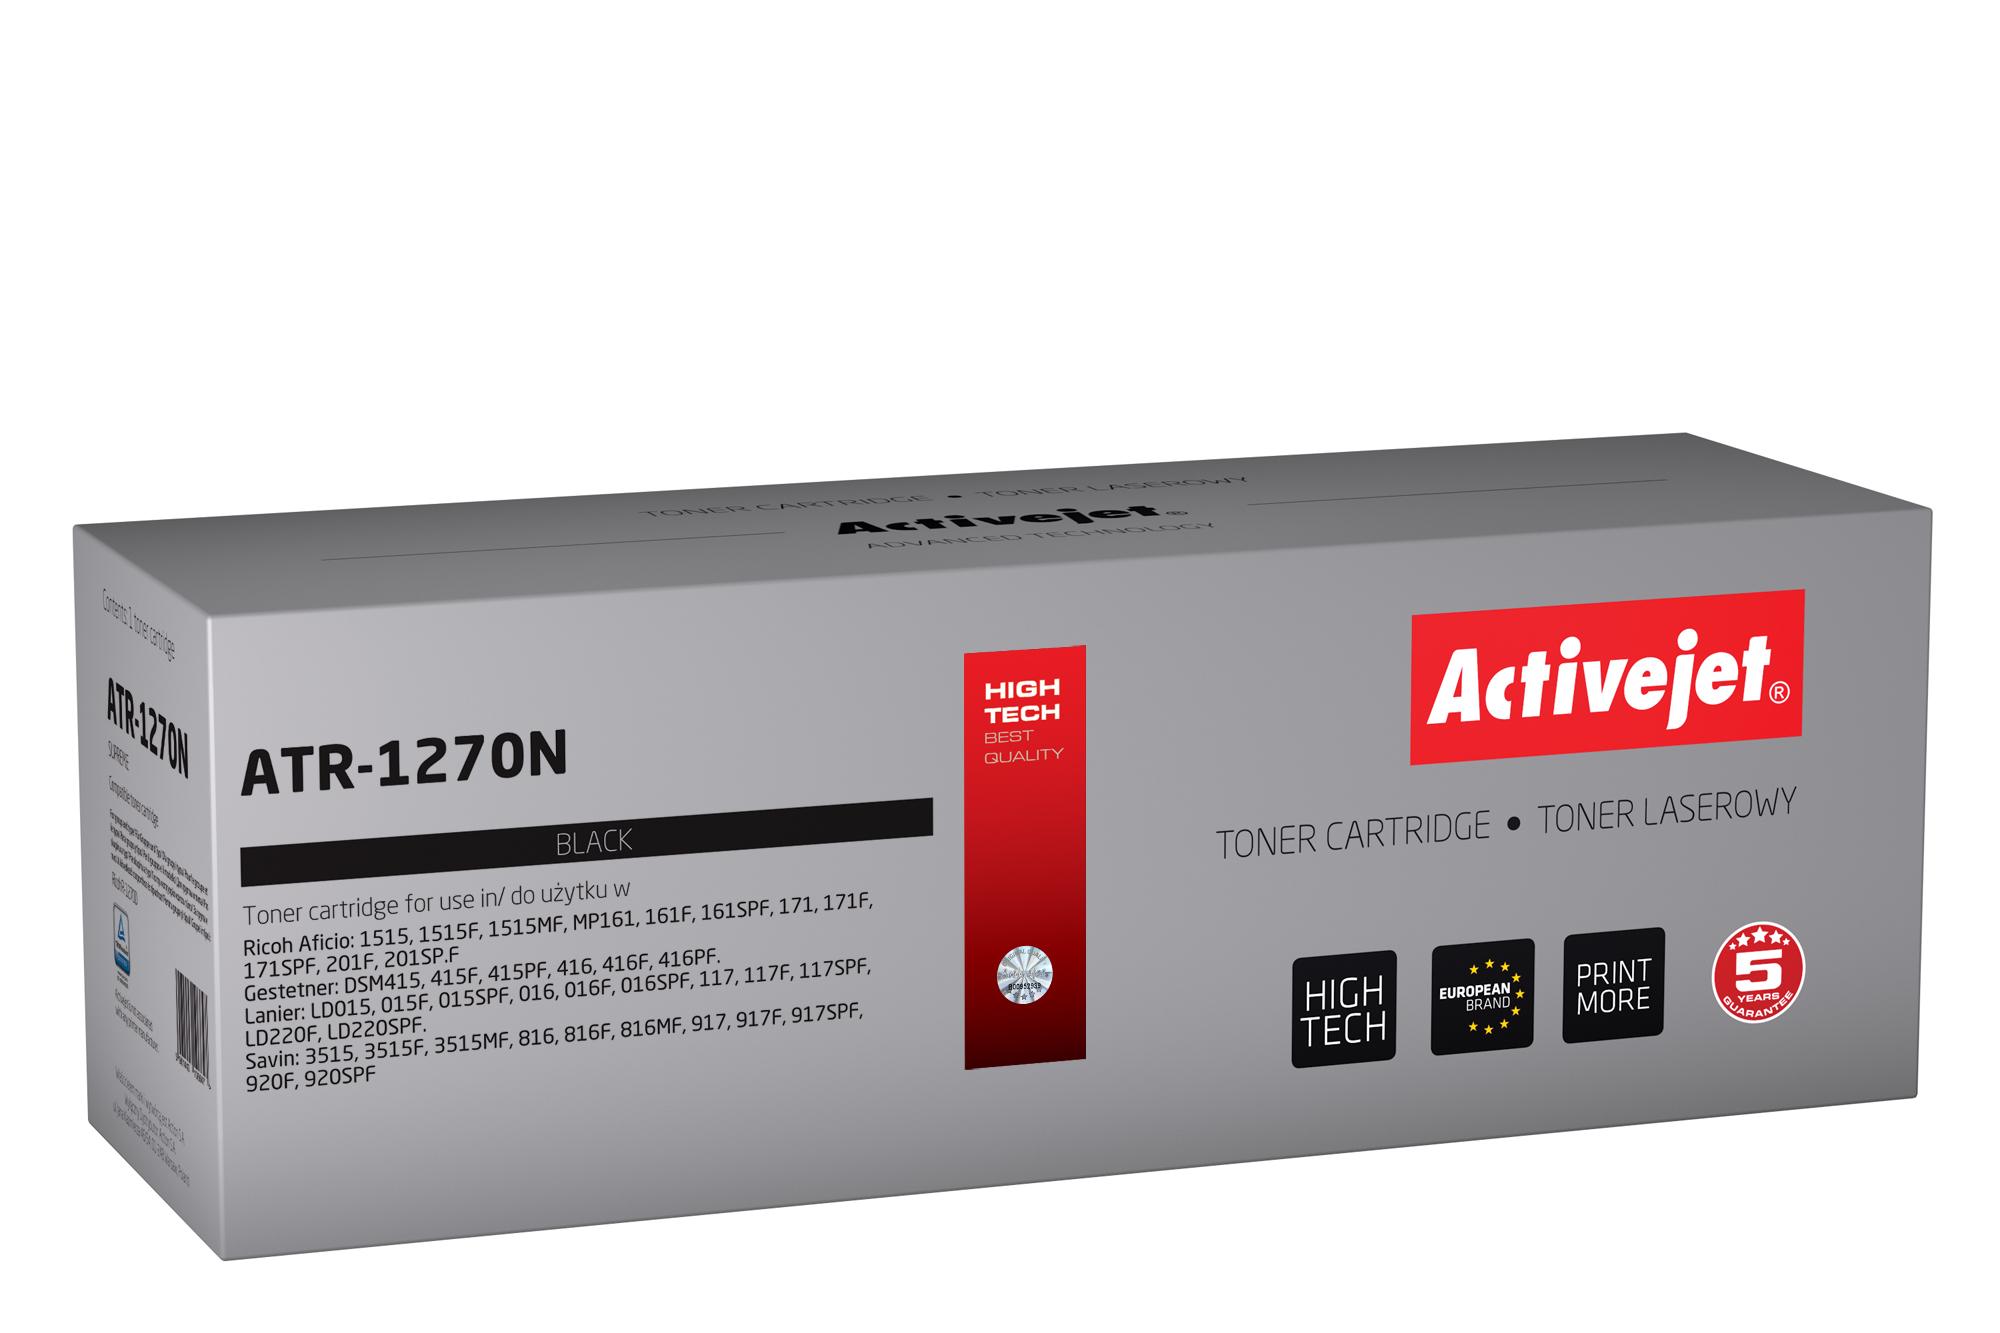 Toner Activejet ATR-1270N (do drukarki Ricoh, zamiennik 1270D 888261, 885476 supreme 7000str. czarny)